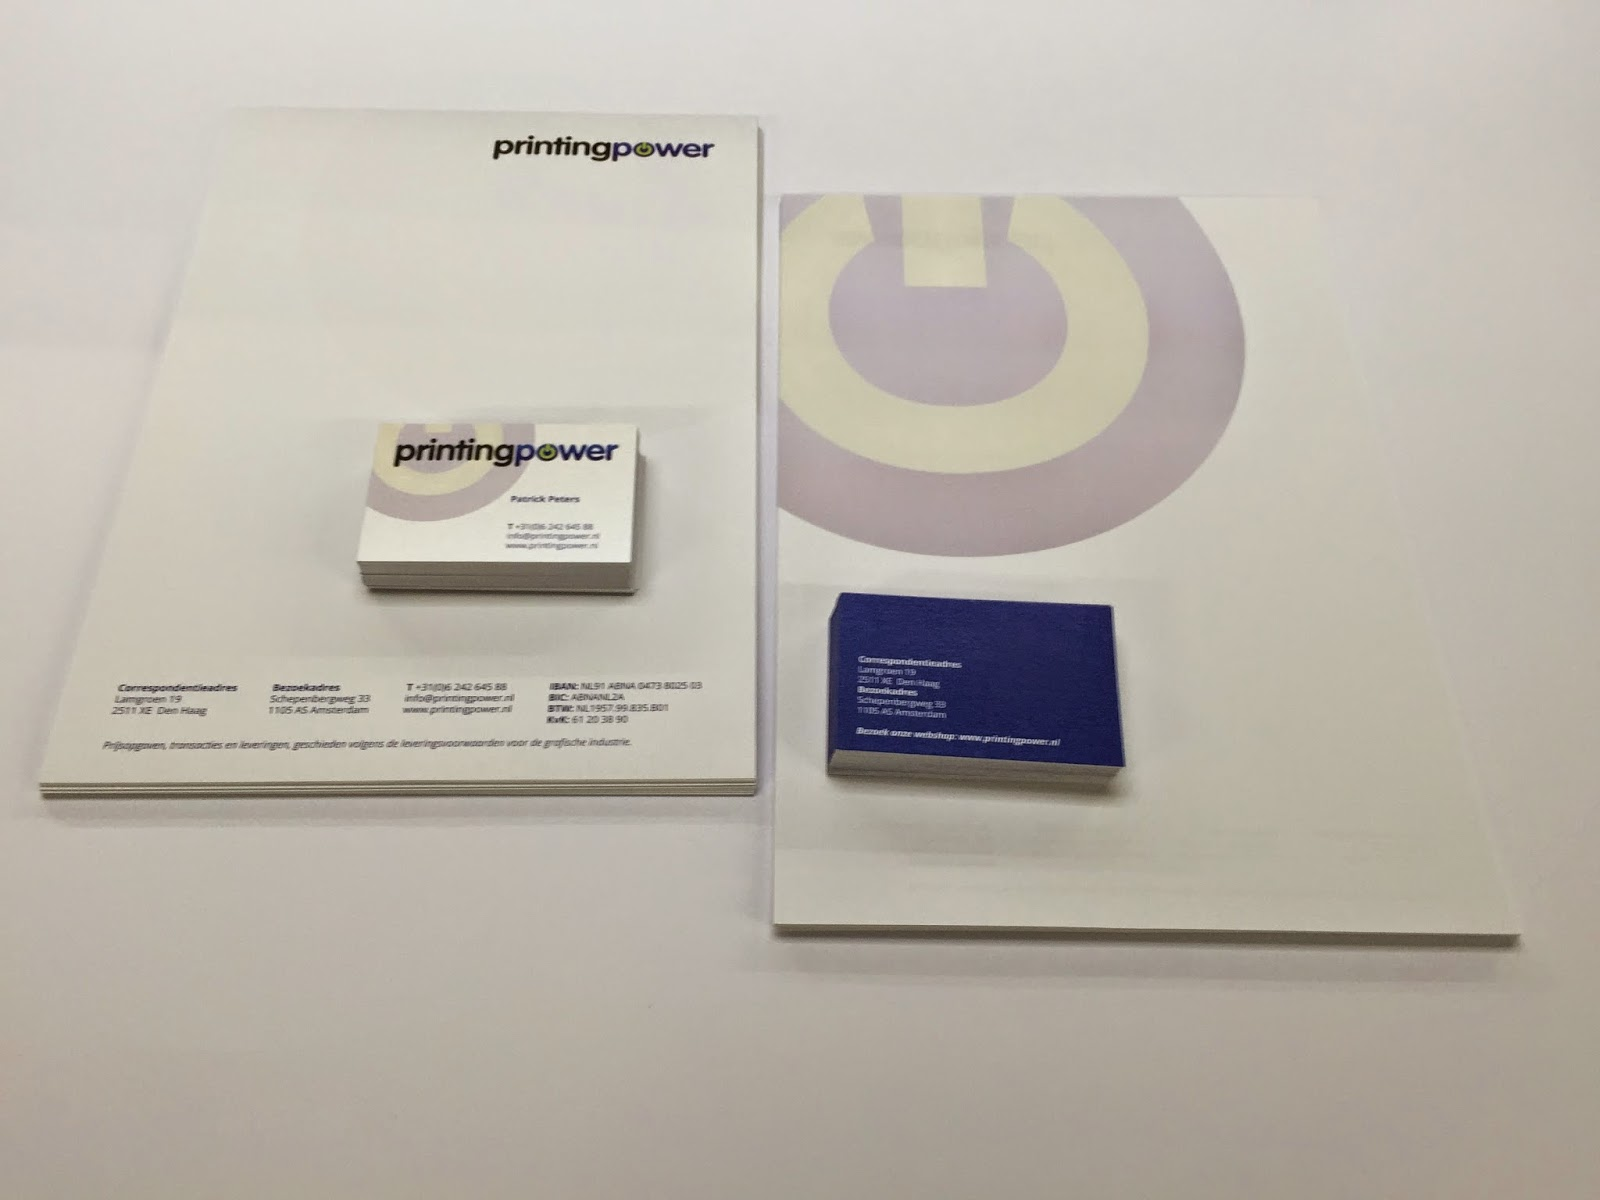 http://printingpower.nl/Huisstijl/Briefpapier